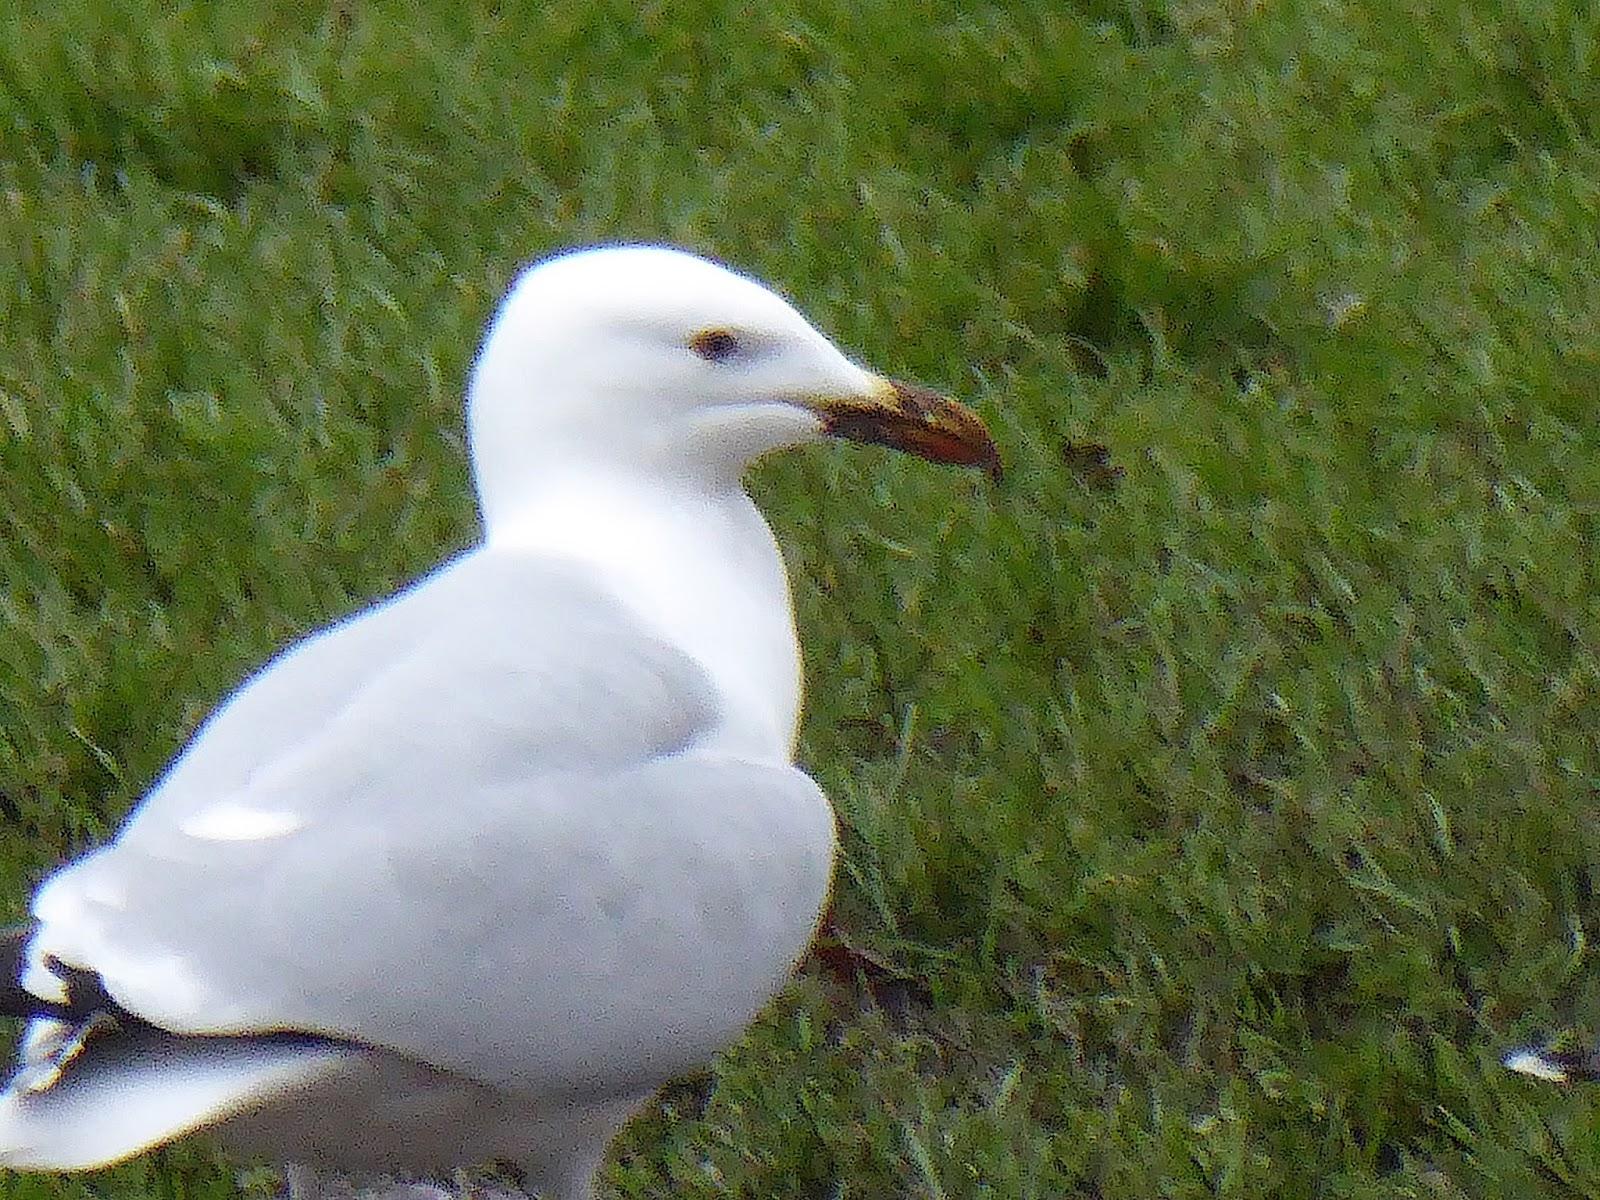 CAMBRIDGESHIRE BIRD CLUB GALLERY: Unidentified Gull